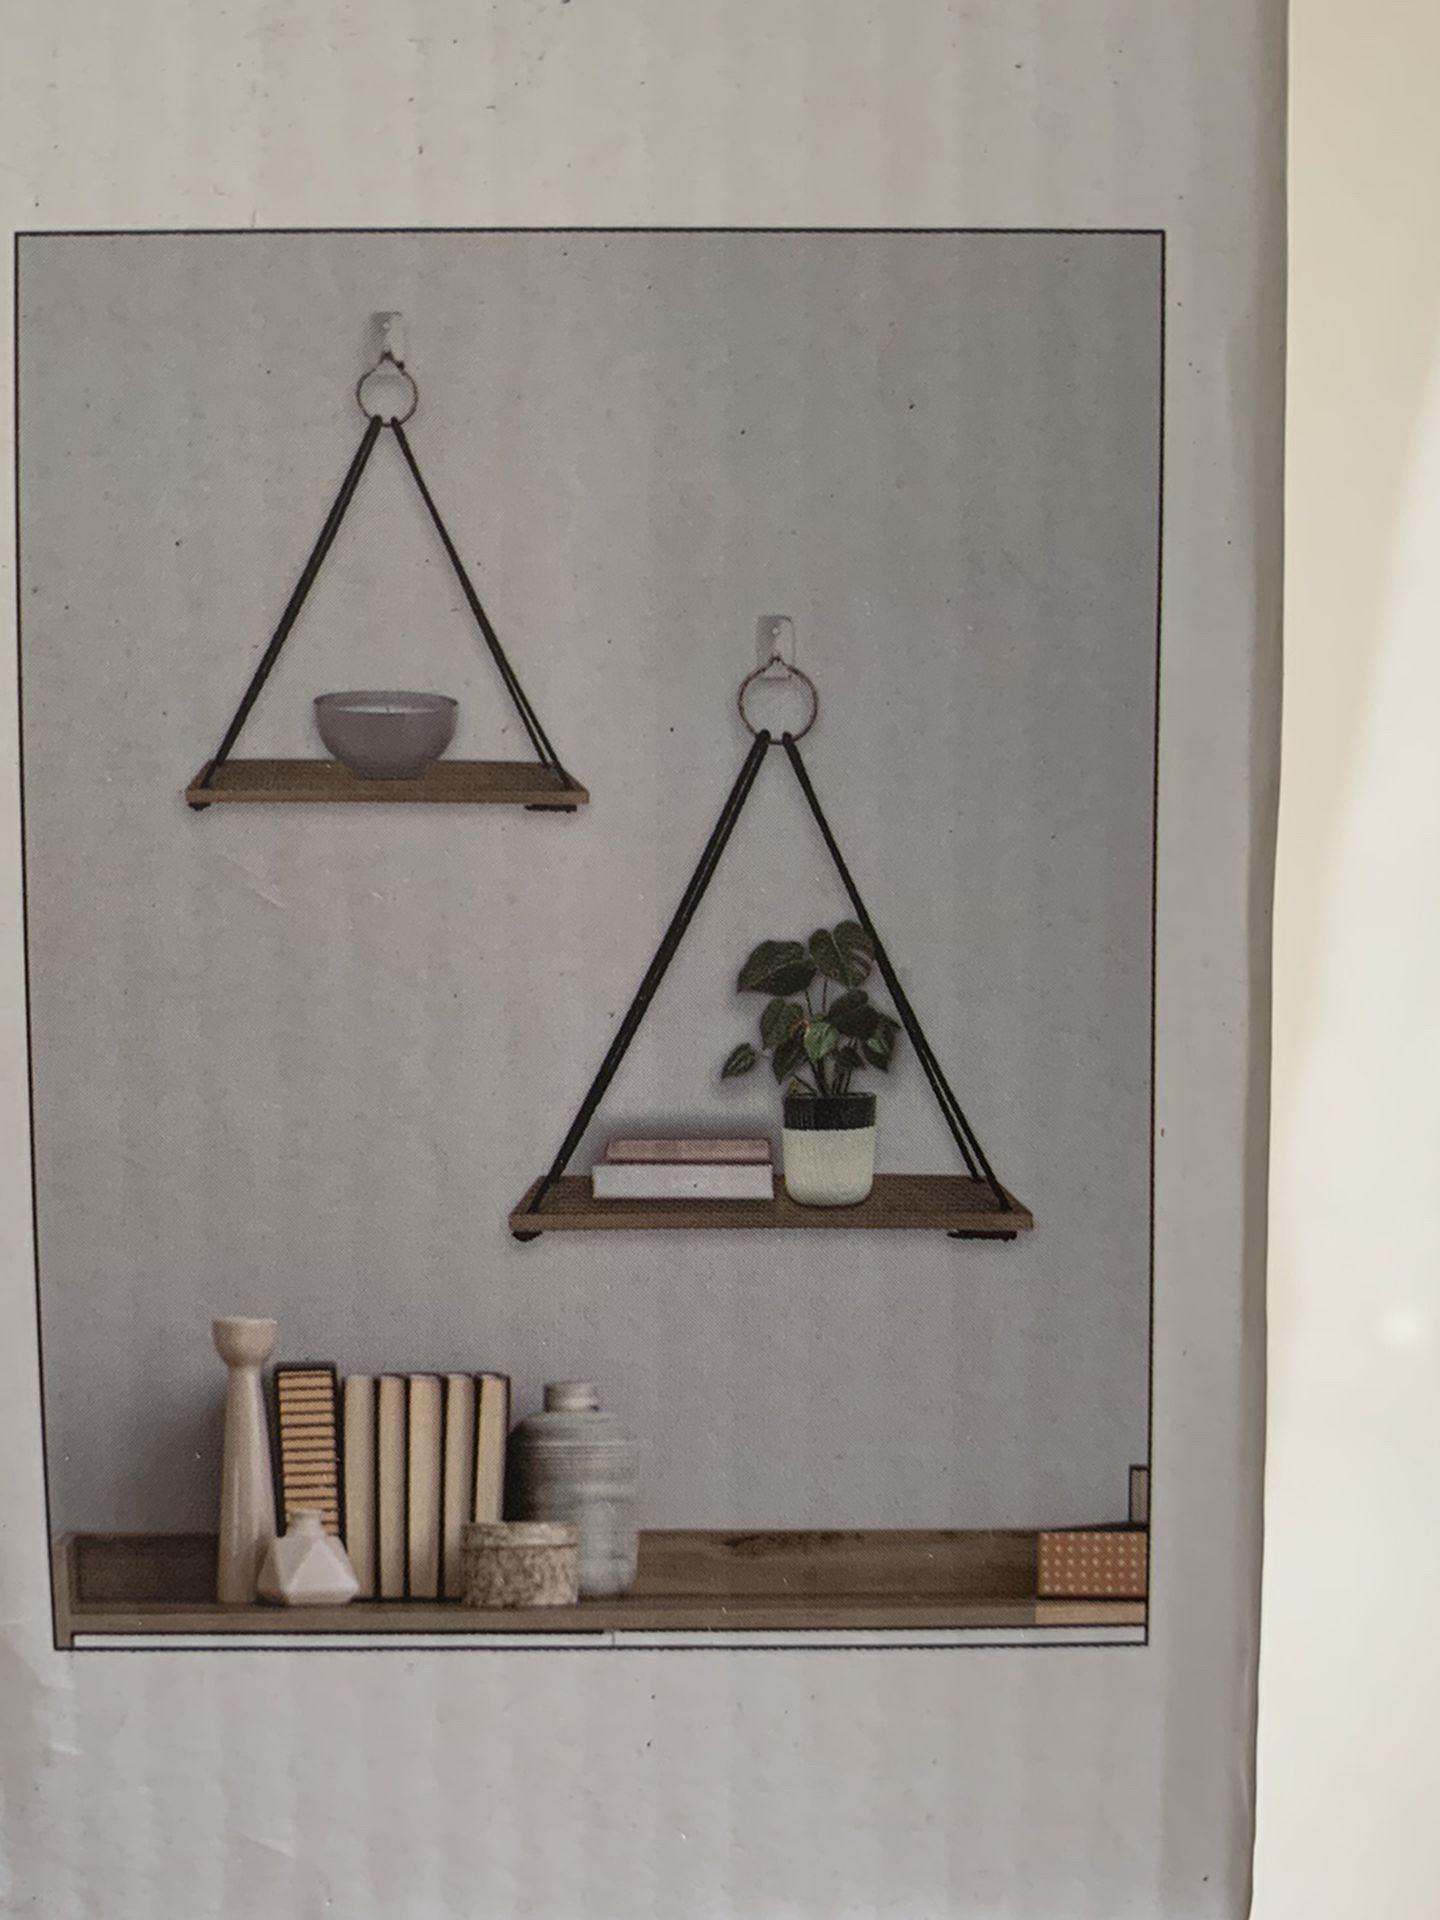 Decorative Hanging Wall Shelves